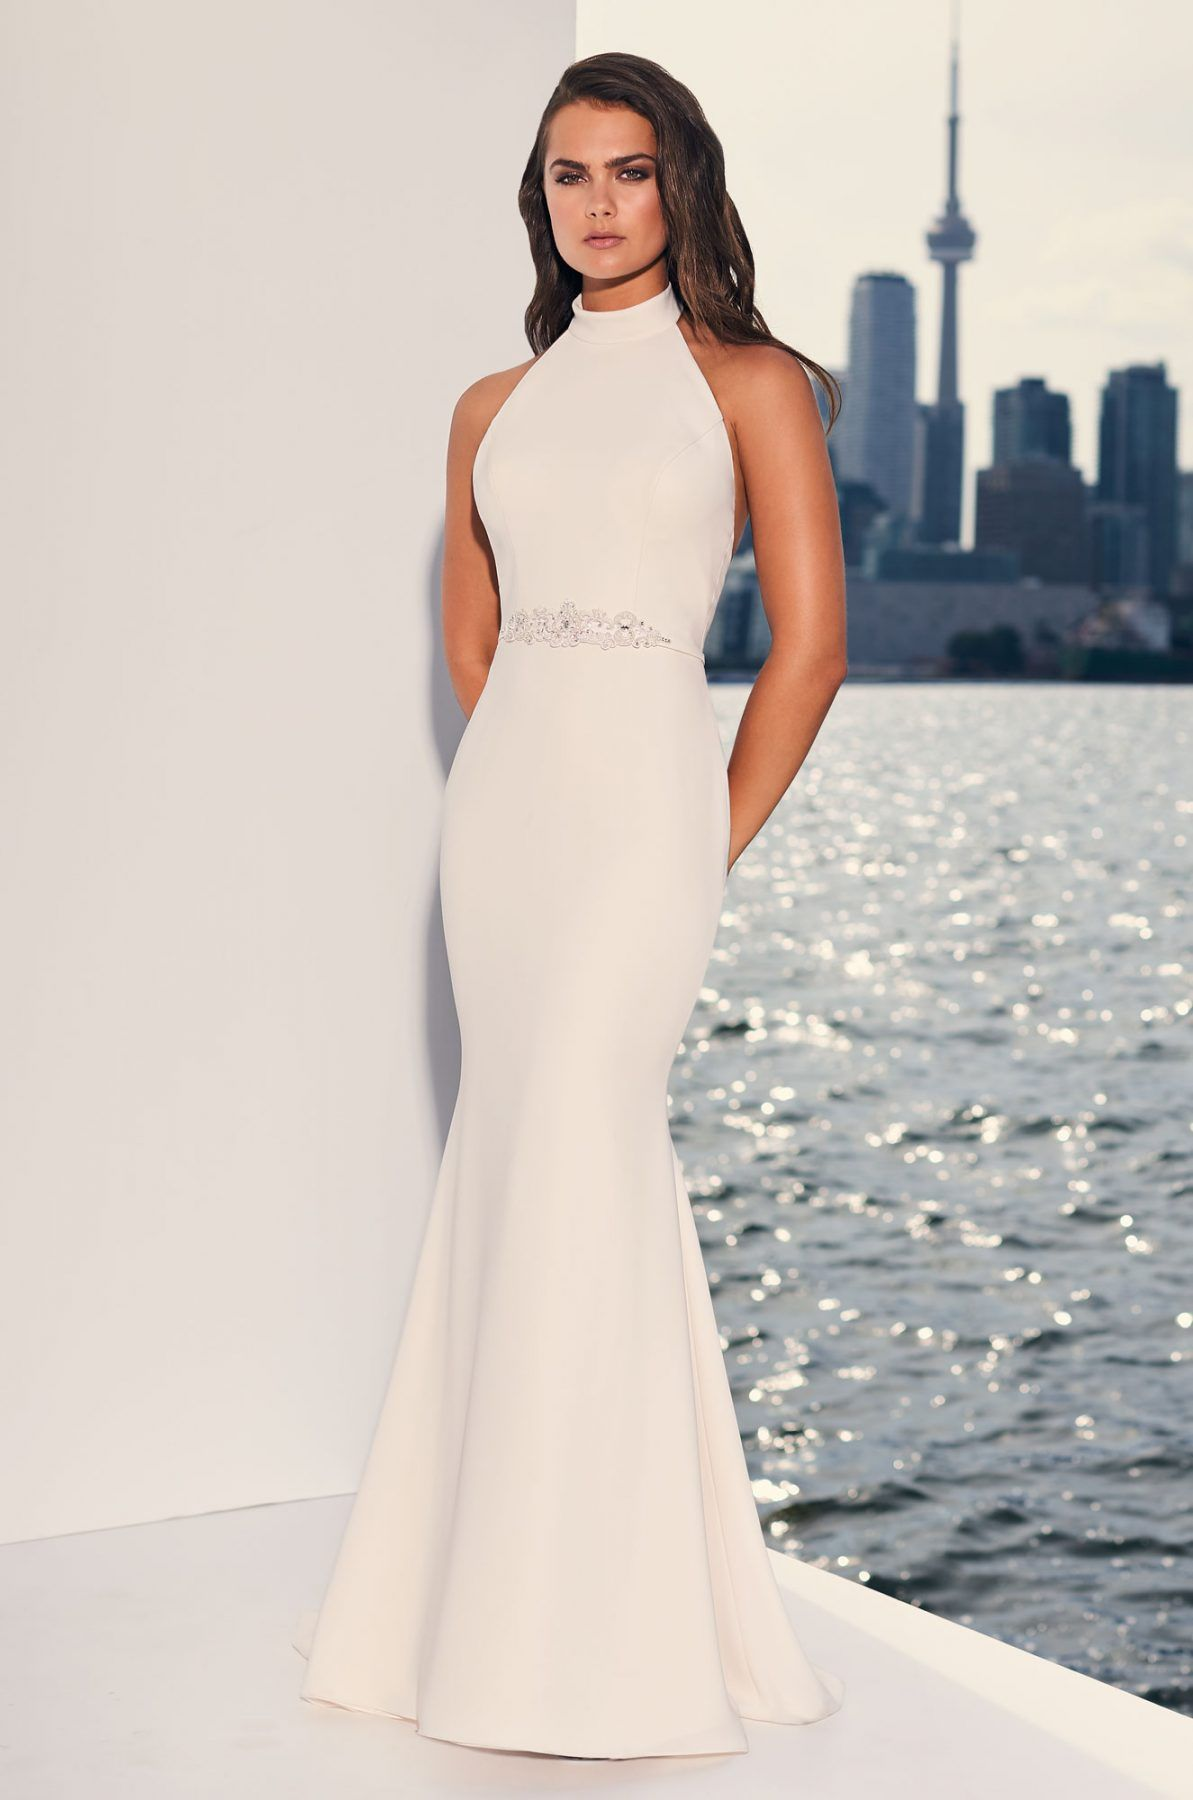 44++ Halter top dress information